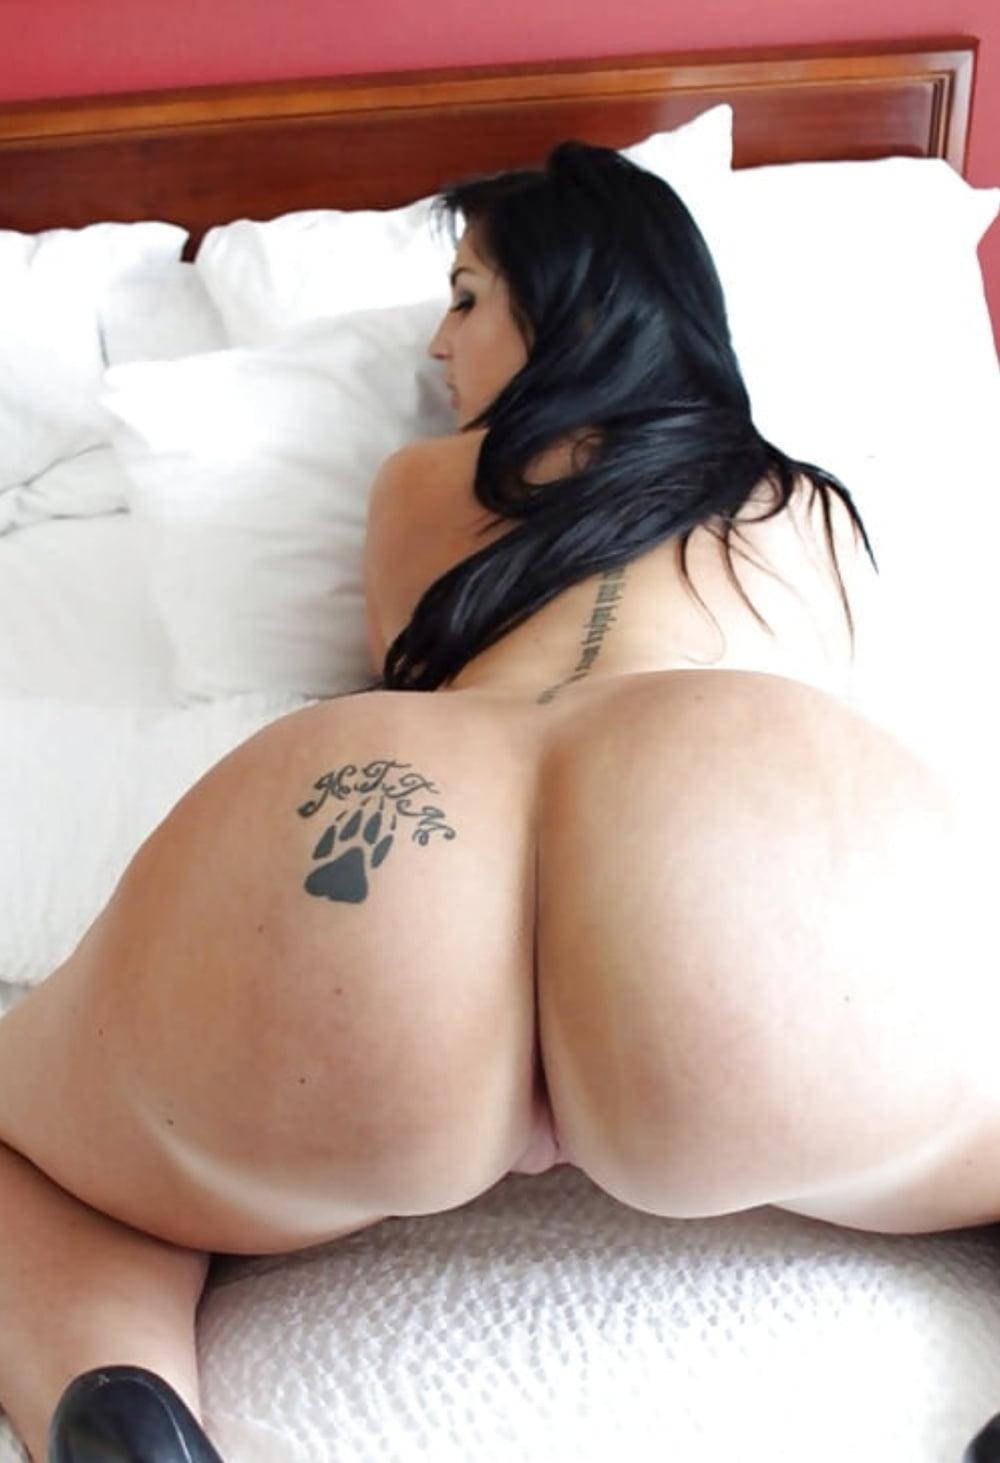 Spreading Ass Cheeks Open Asian Free Sex Pics